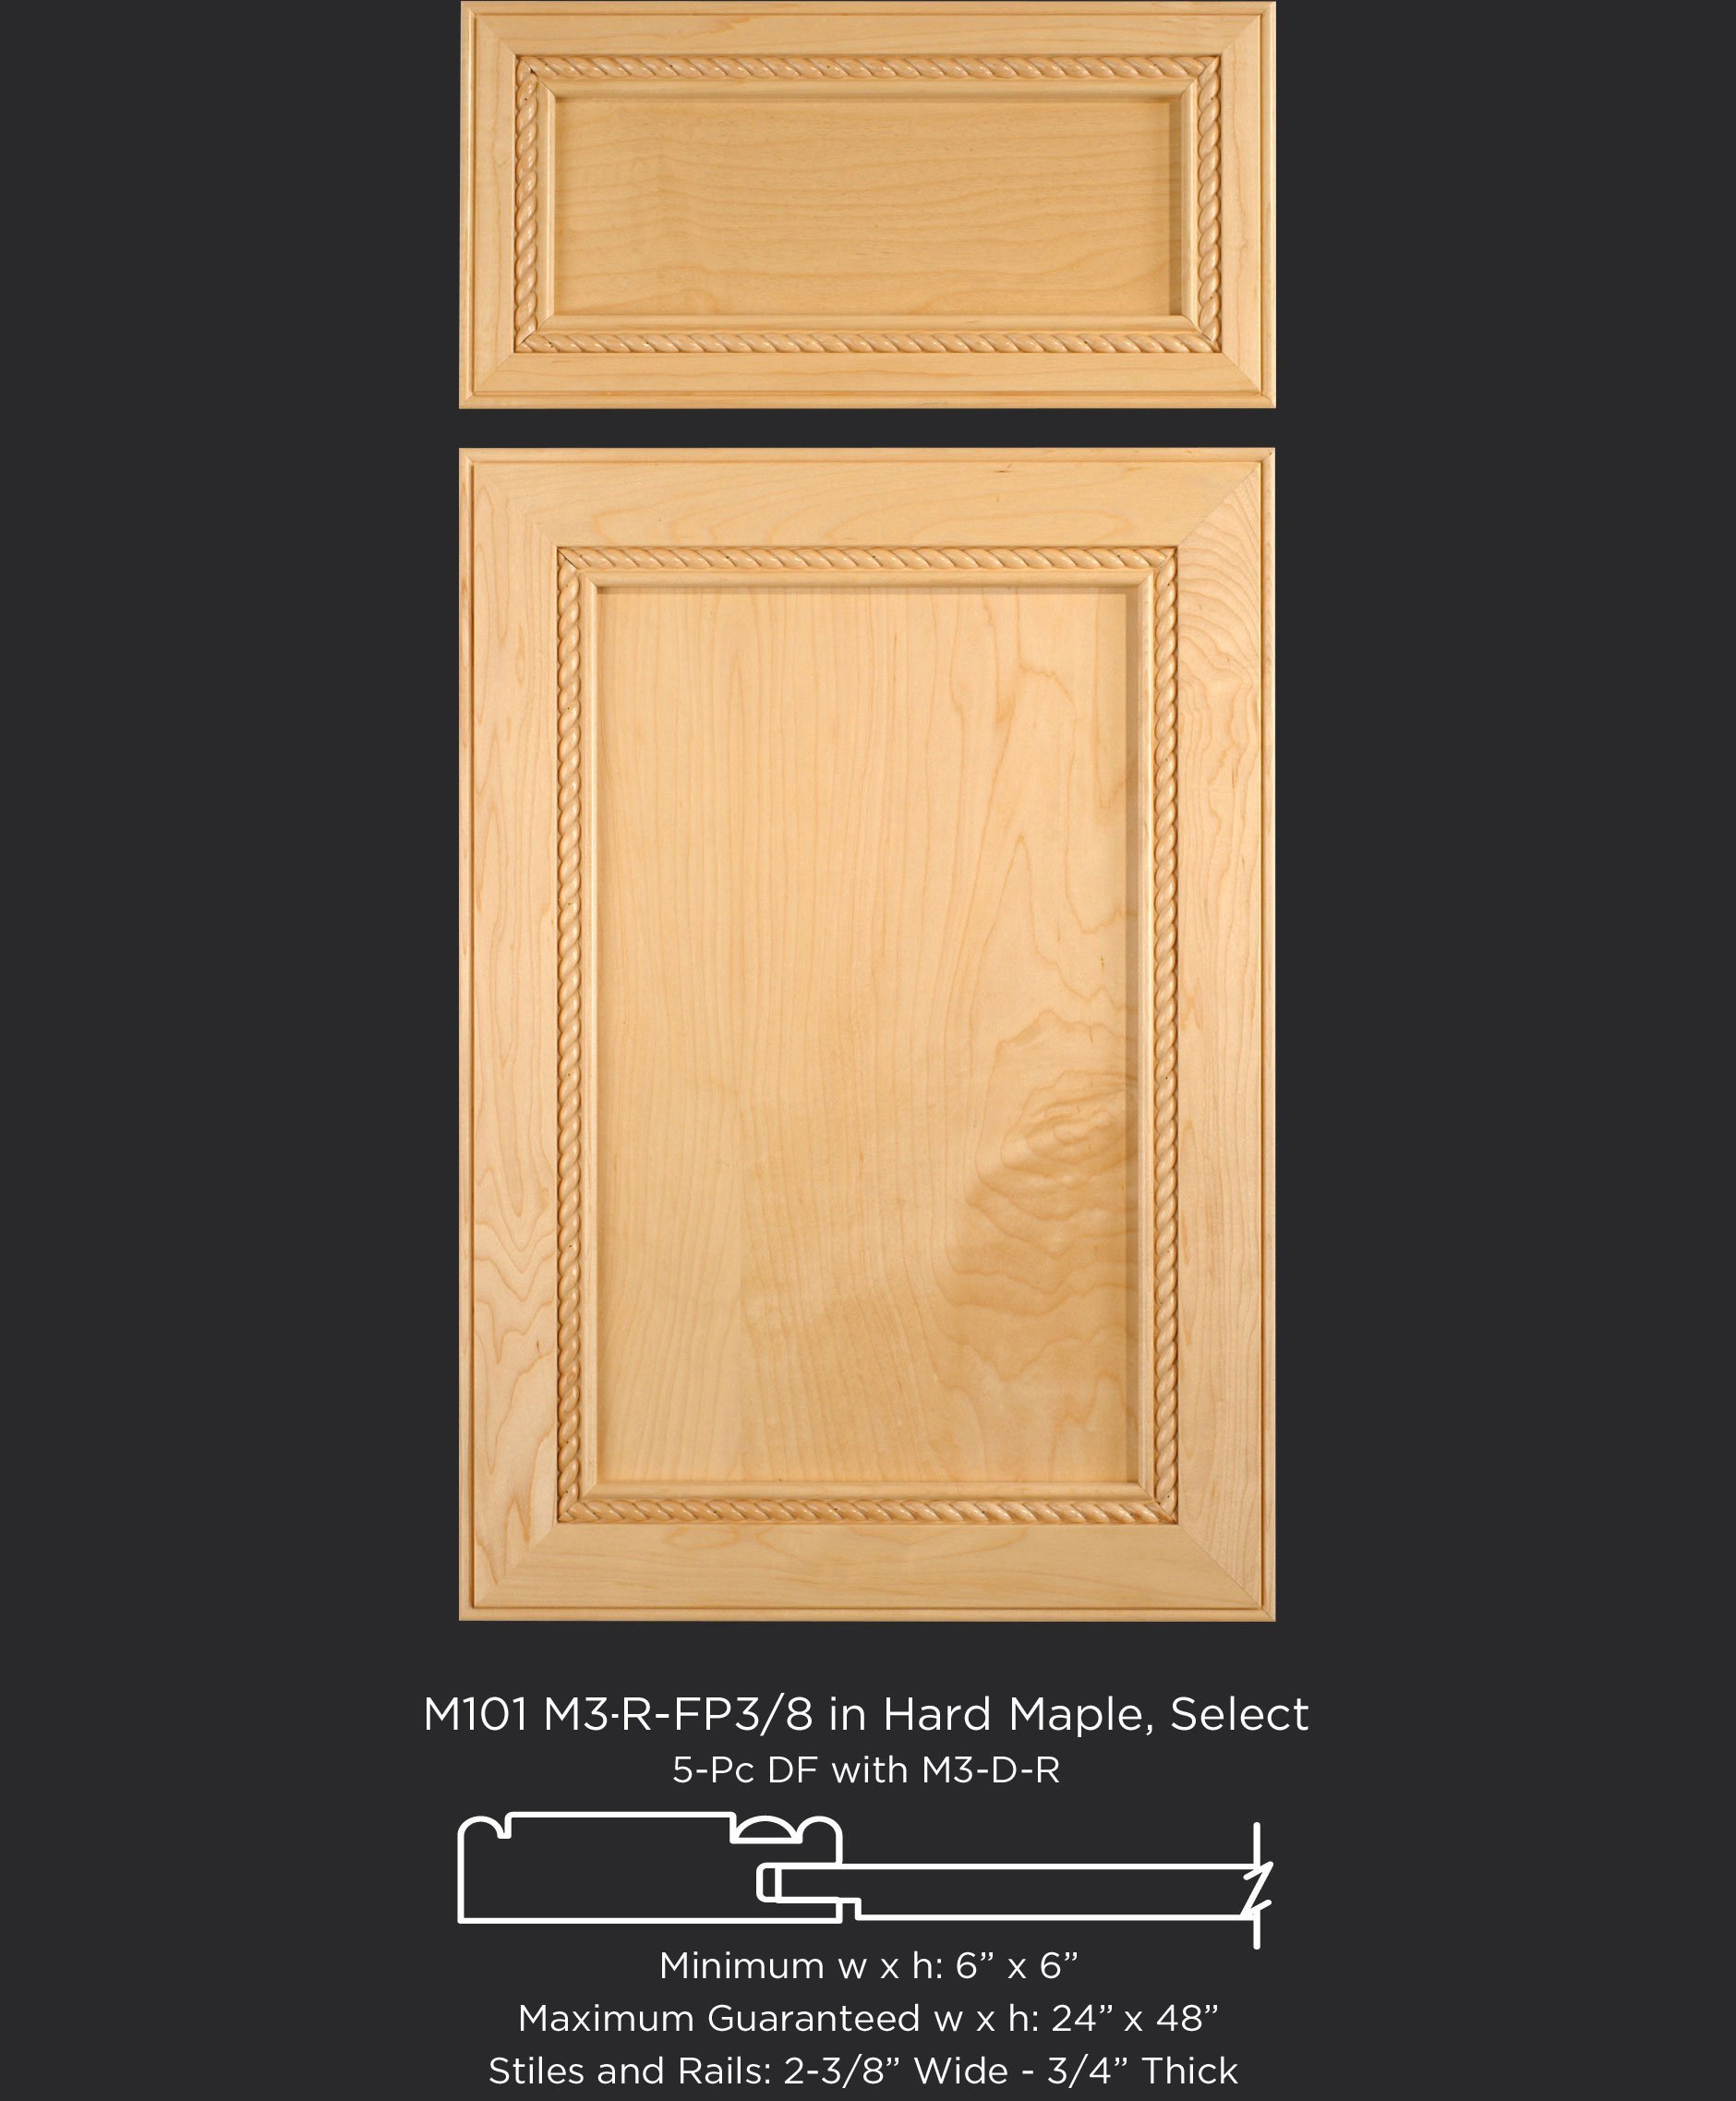 Custom Bathroom Vanities San Antonio Tx cabinet remodeling san antonio, tx | door options | custom cabinets